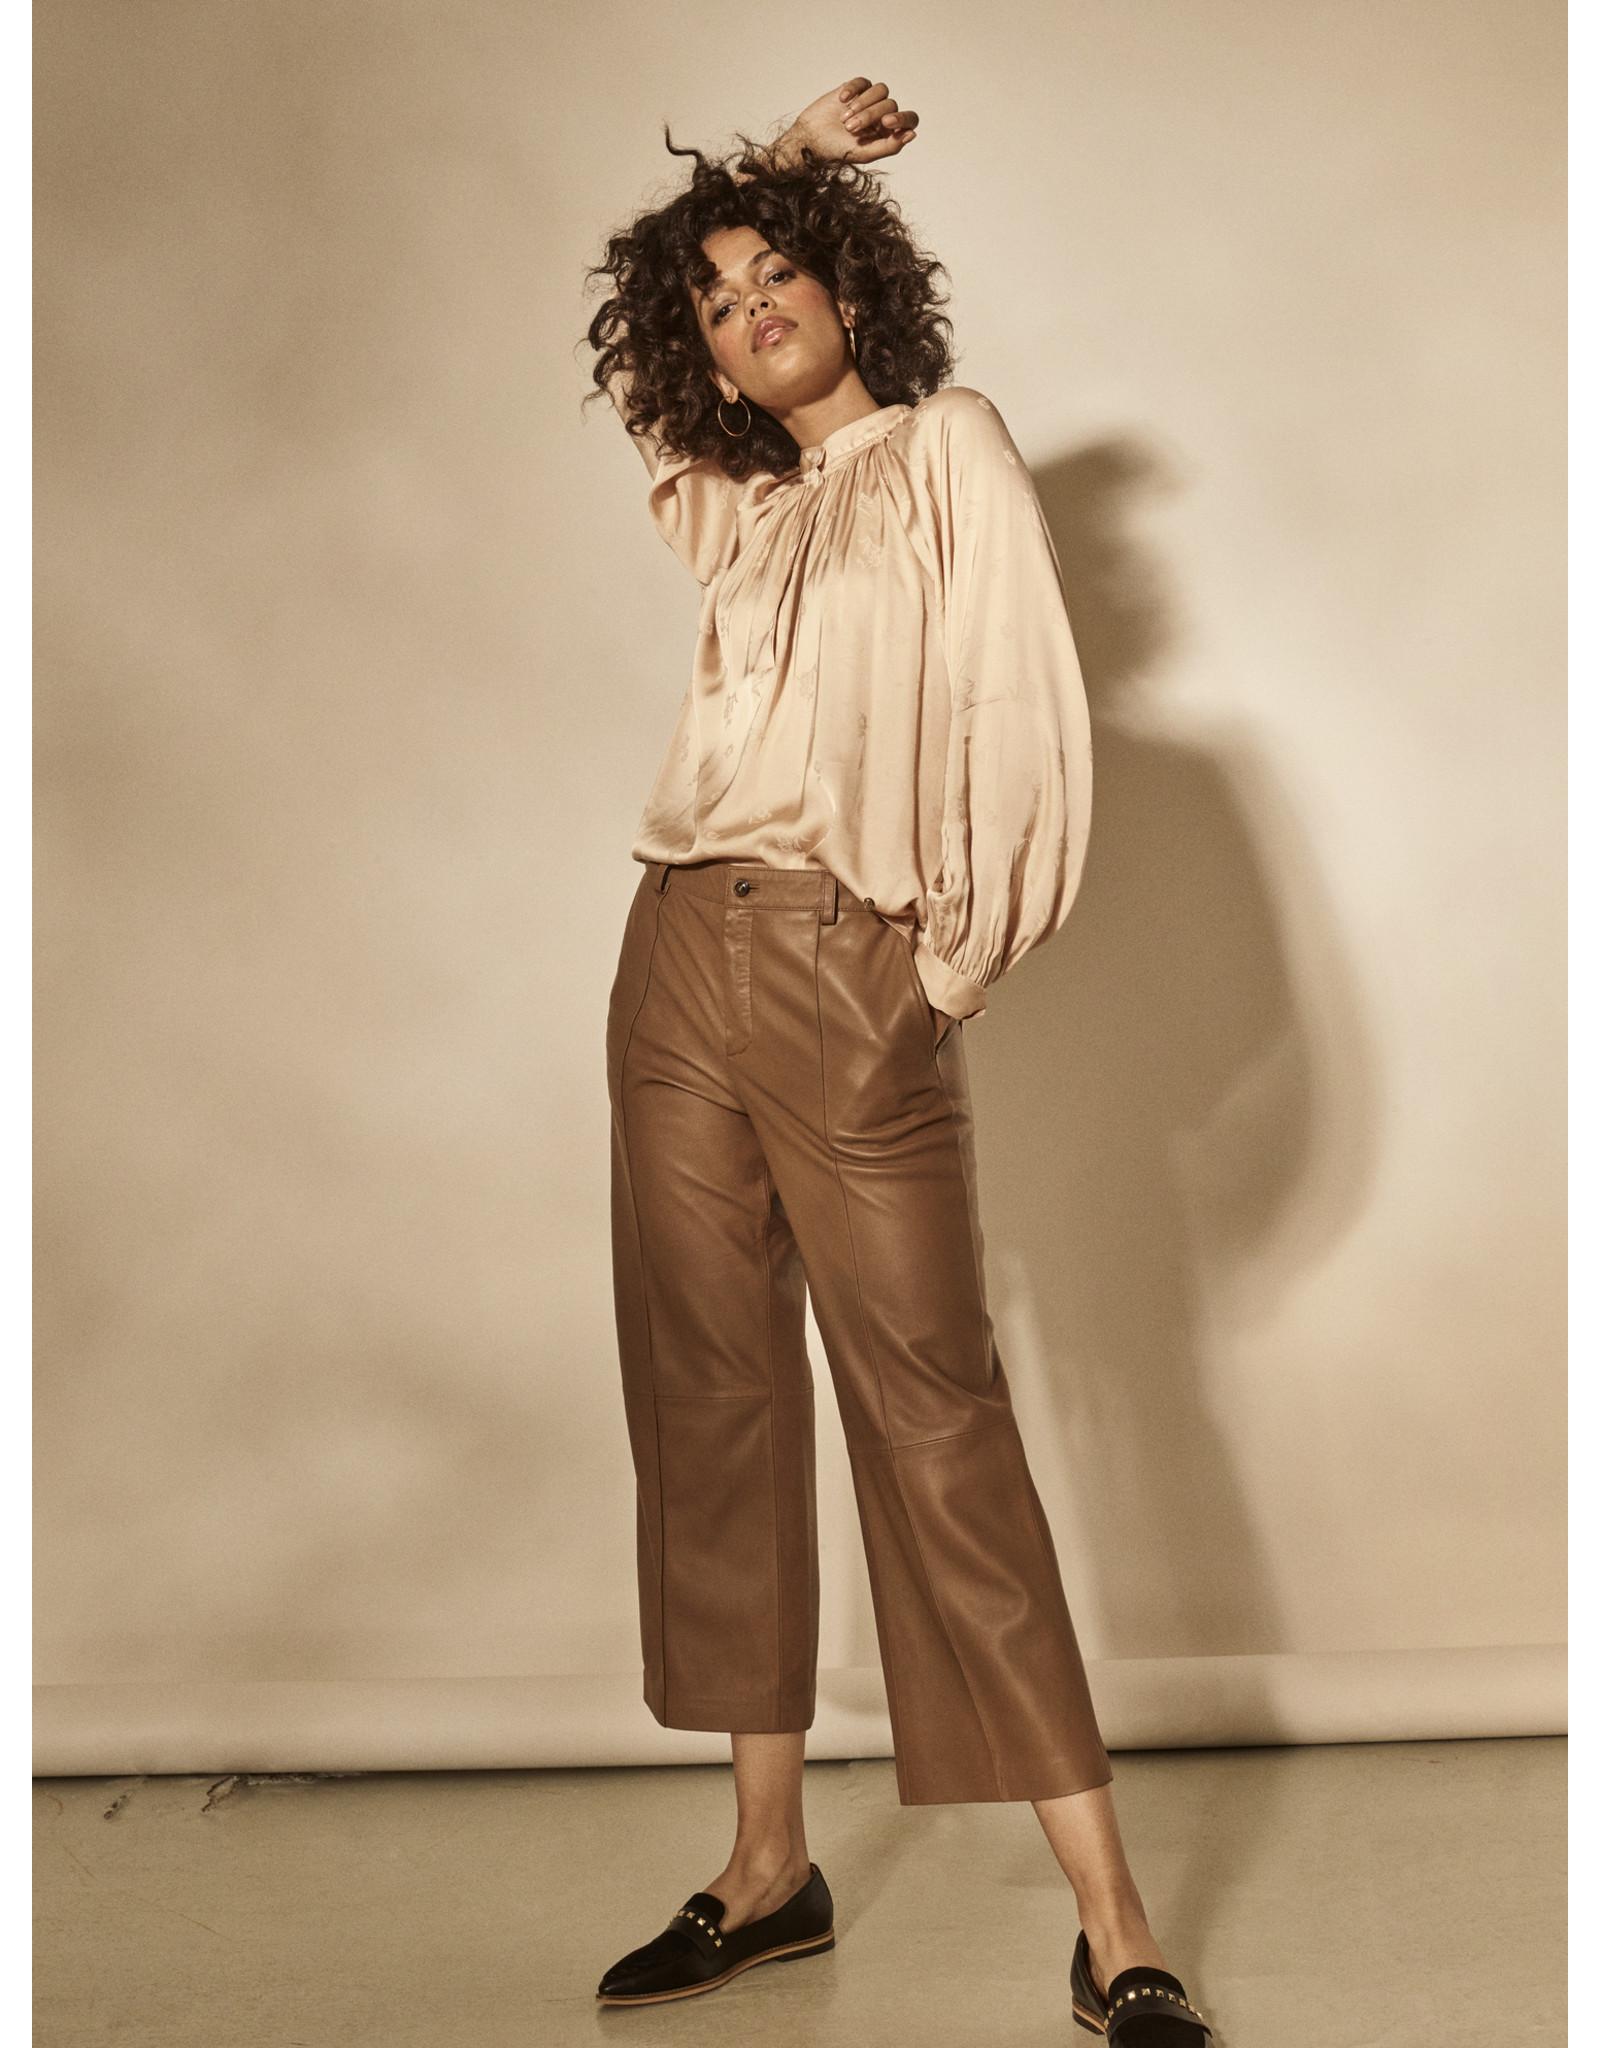 Mos Mosh 134970 - Como Leather Pant - Cropped Carafe